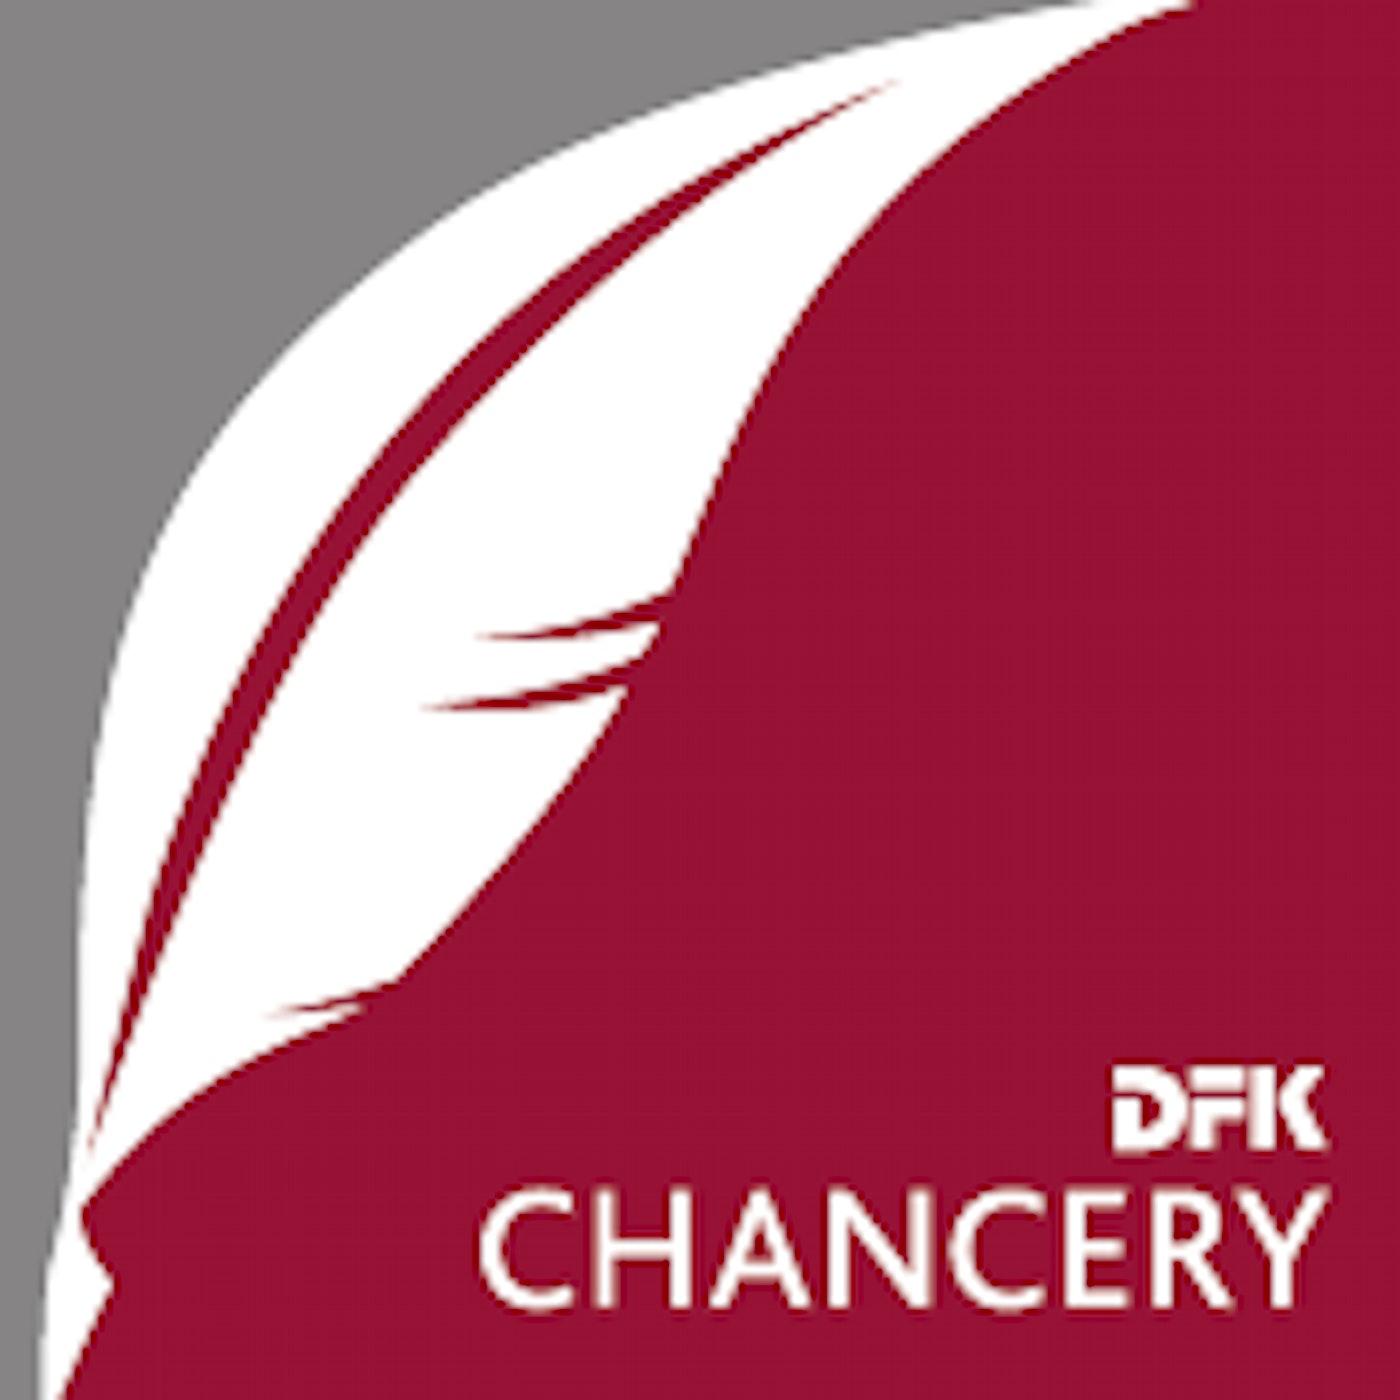 DFK Chancery